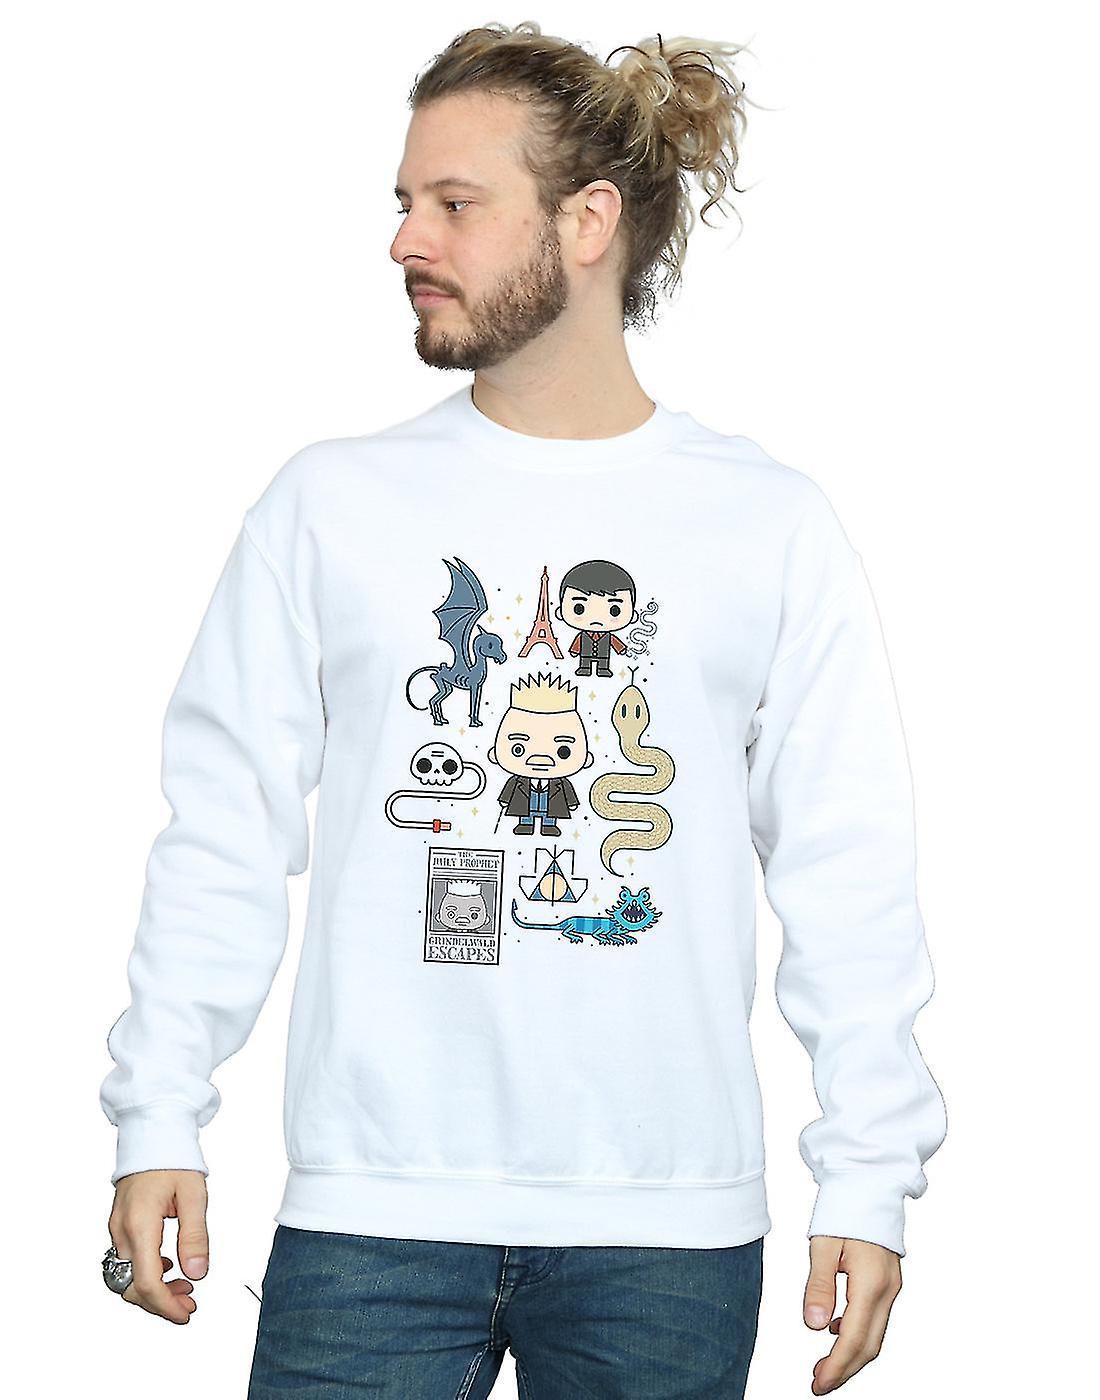 Fantastic Beasts Men's Chibi Grindelwald Sweatshirt